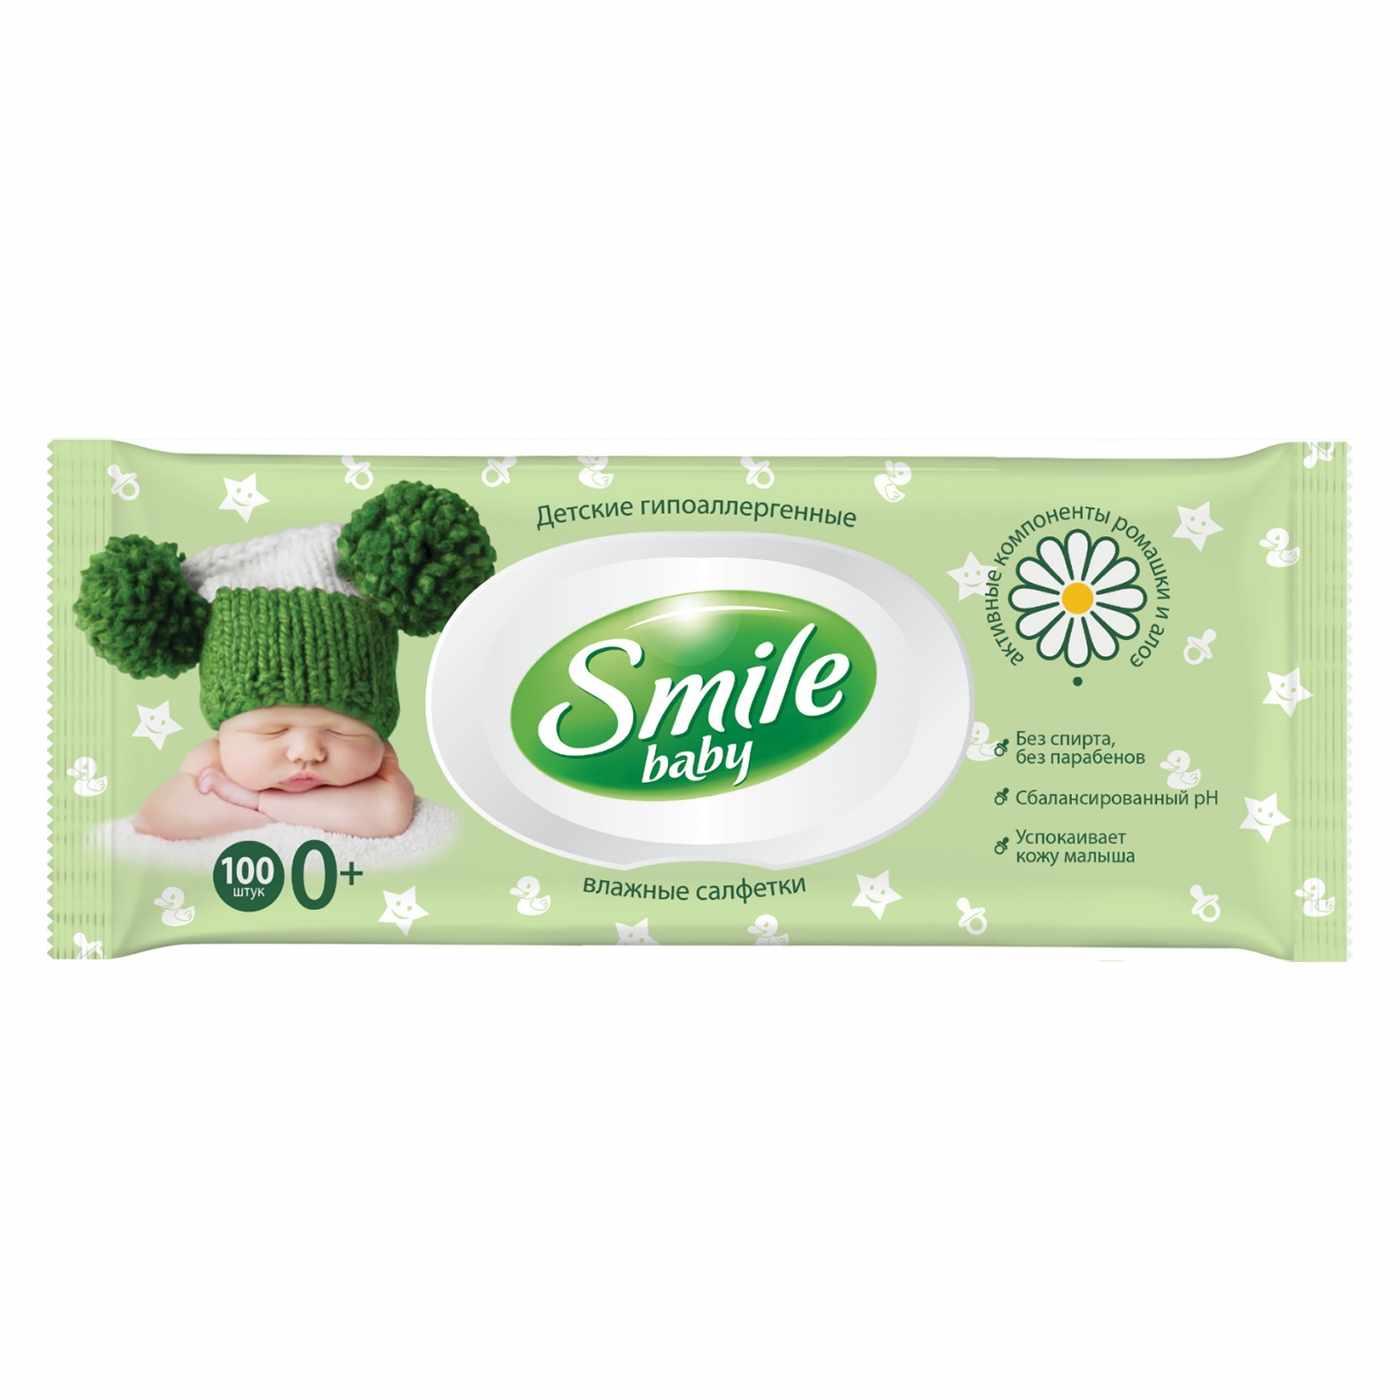 SMILE BABY Салф.влаж.Фитолиния 100шт./9/5715